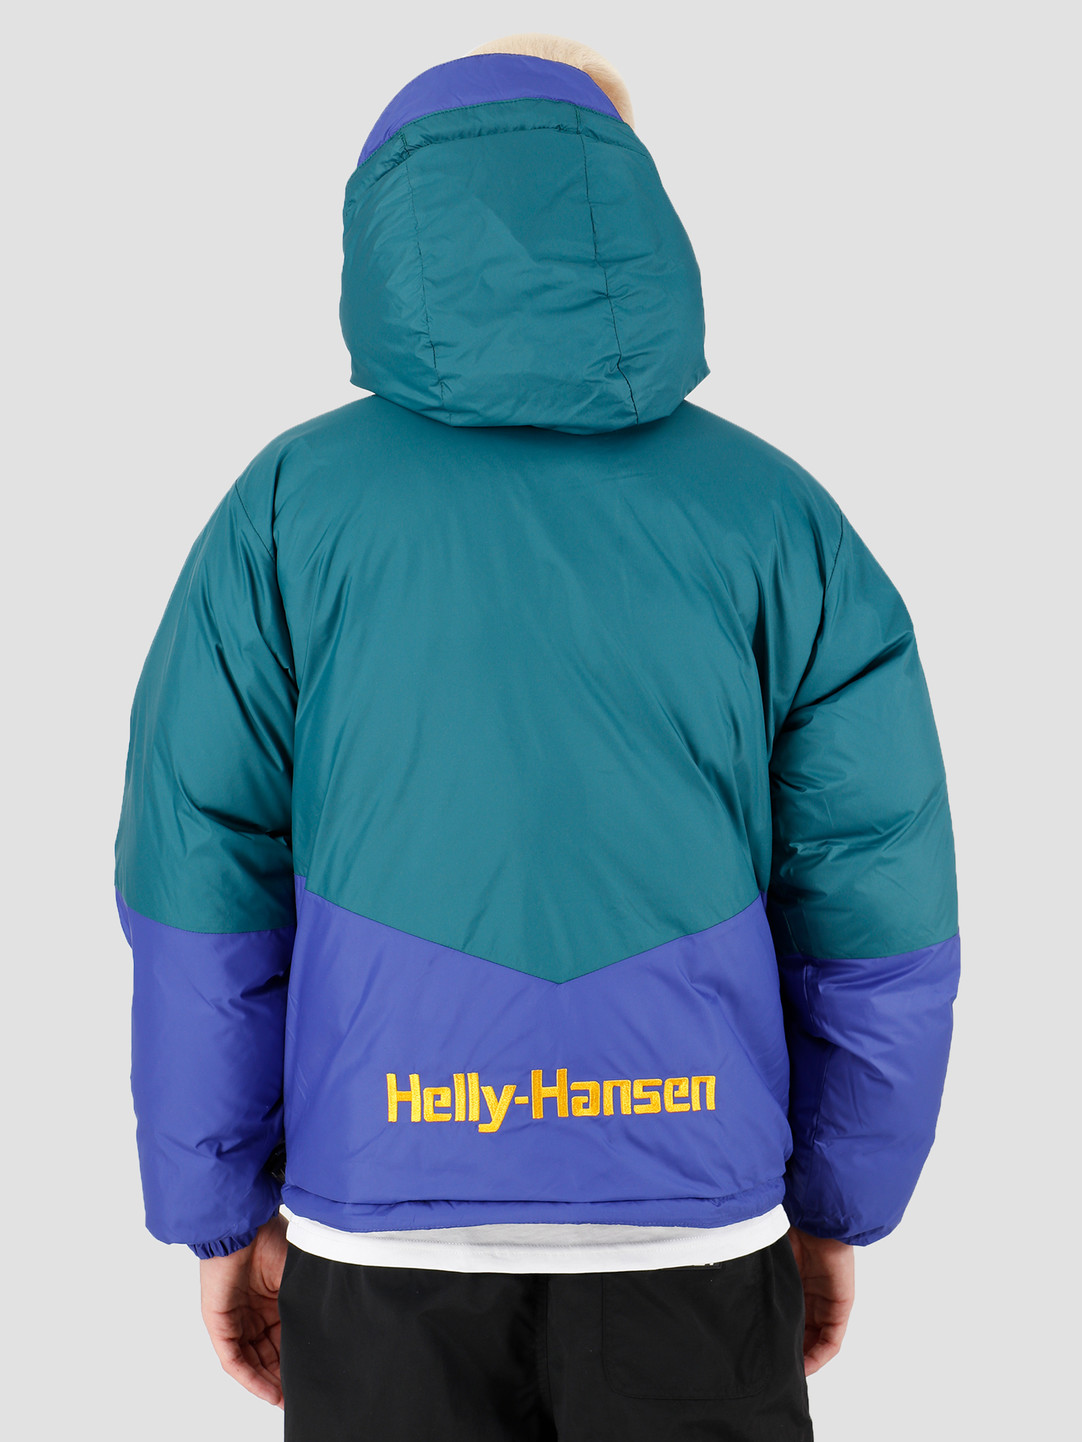 Helly Hansen Helly Hansen Heritage Reversible Puffer Jac 634 Heritage Blue 53353